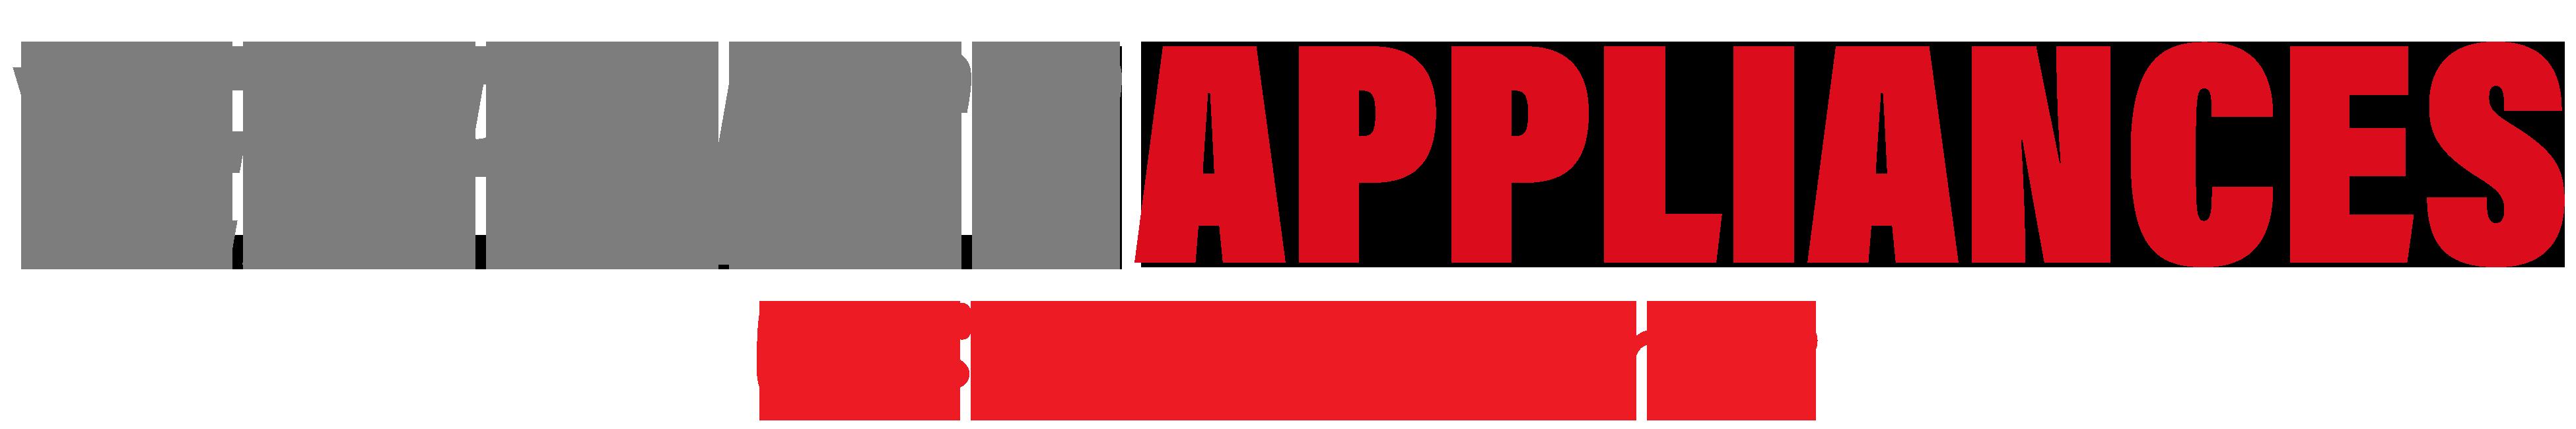 Express Appliances